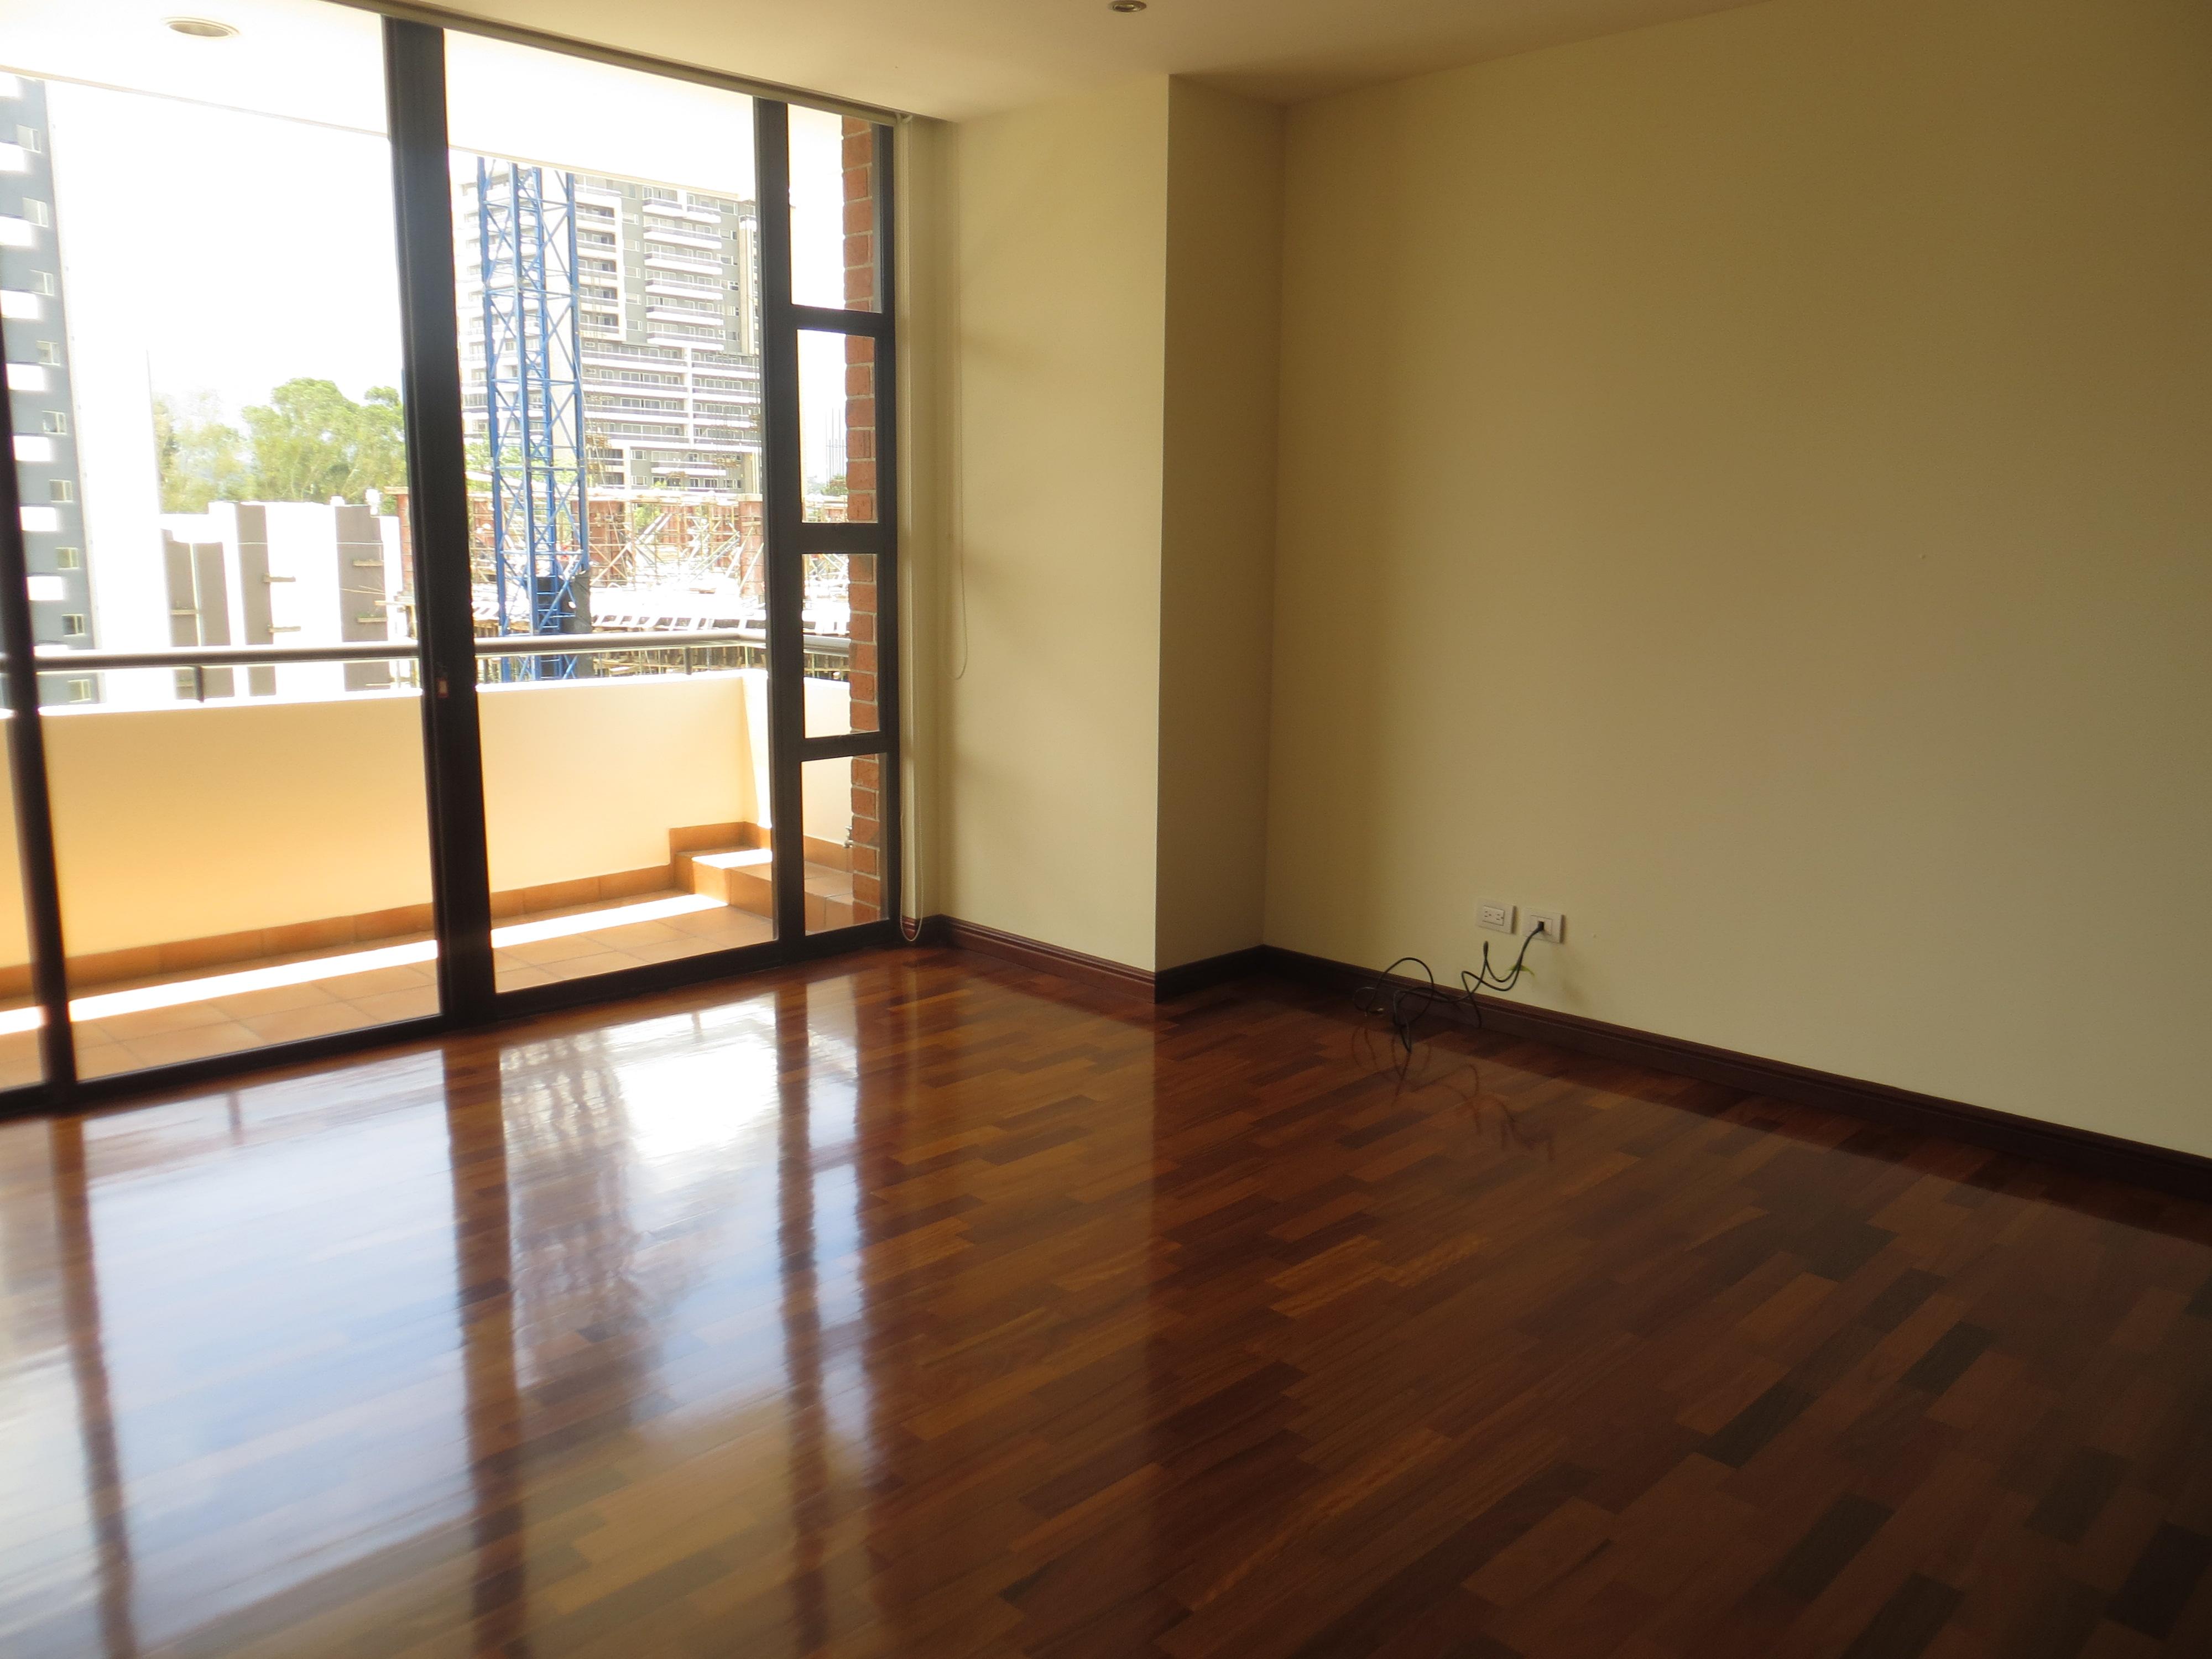 Alquiler de apartamento en edificio con piscina